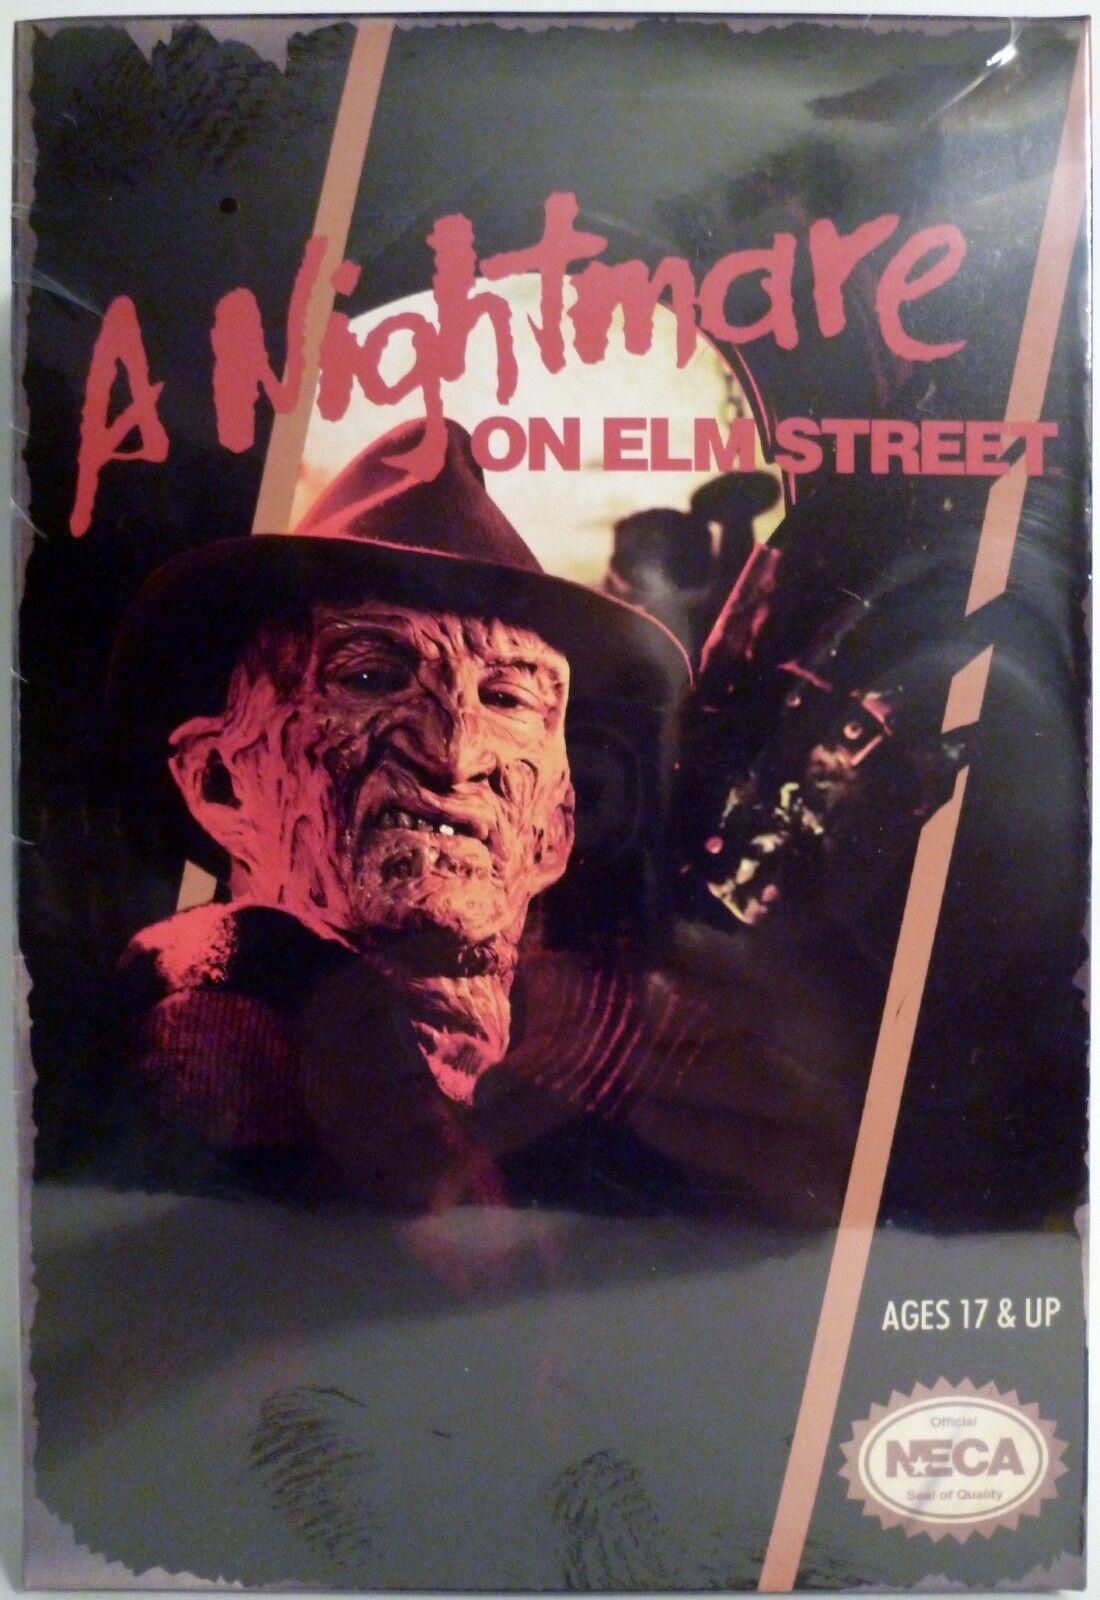 FROTDY KRUEGER A Nightmare on Elm St. 8-bit NES Video Game 7